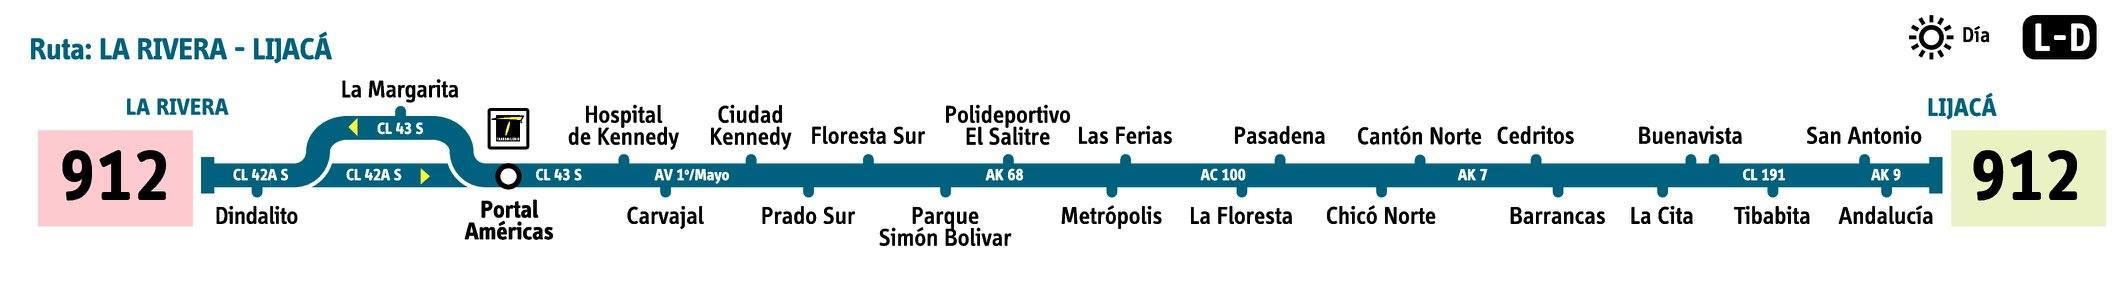 Diagrama ruta urbana 912